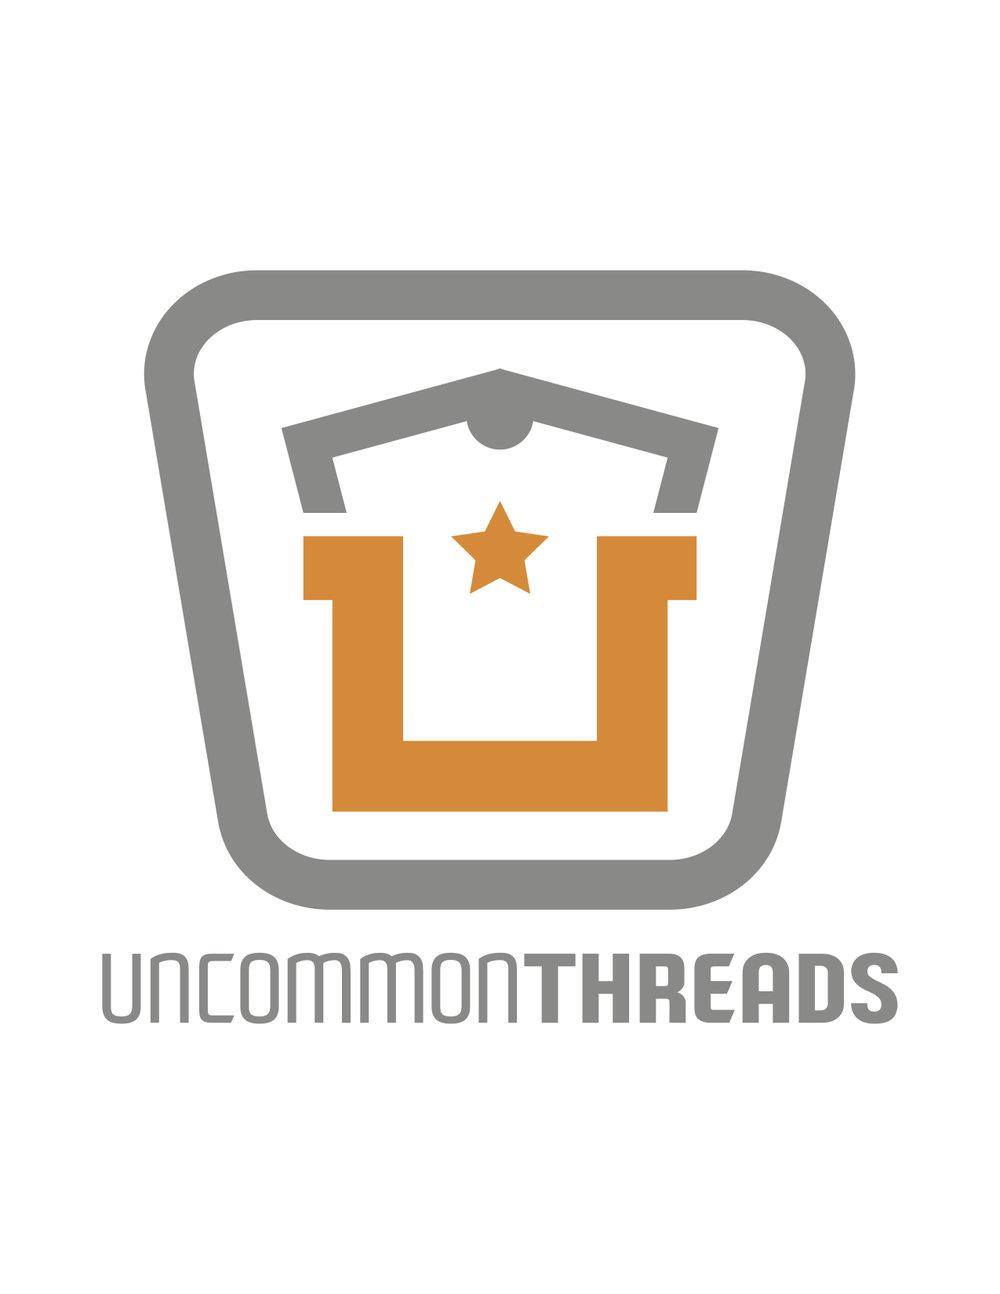 Uncommon Threads logo.jpg